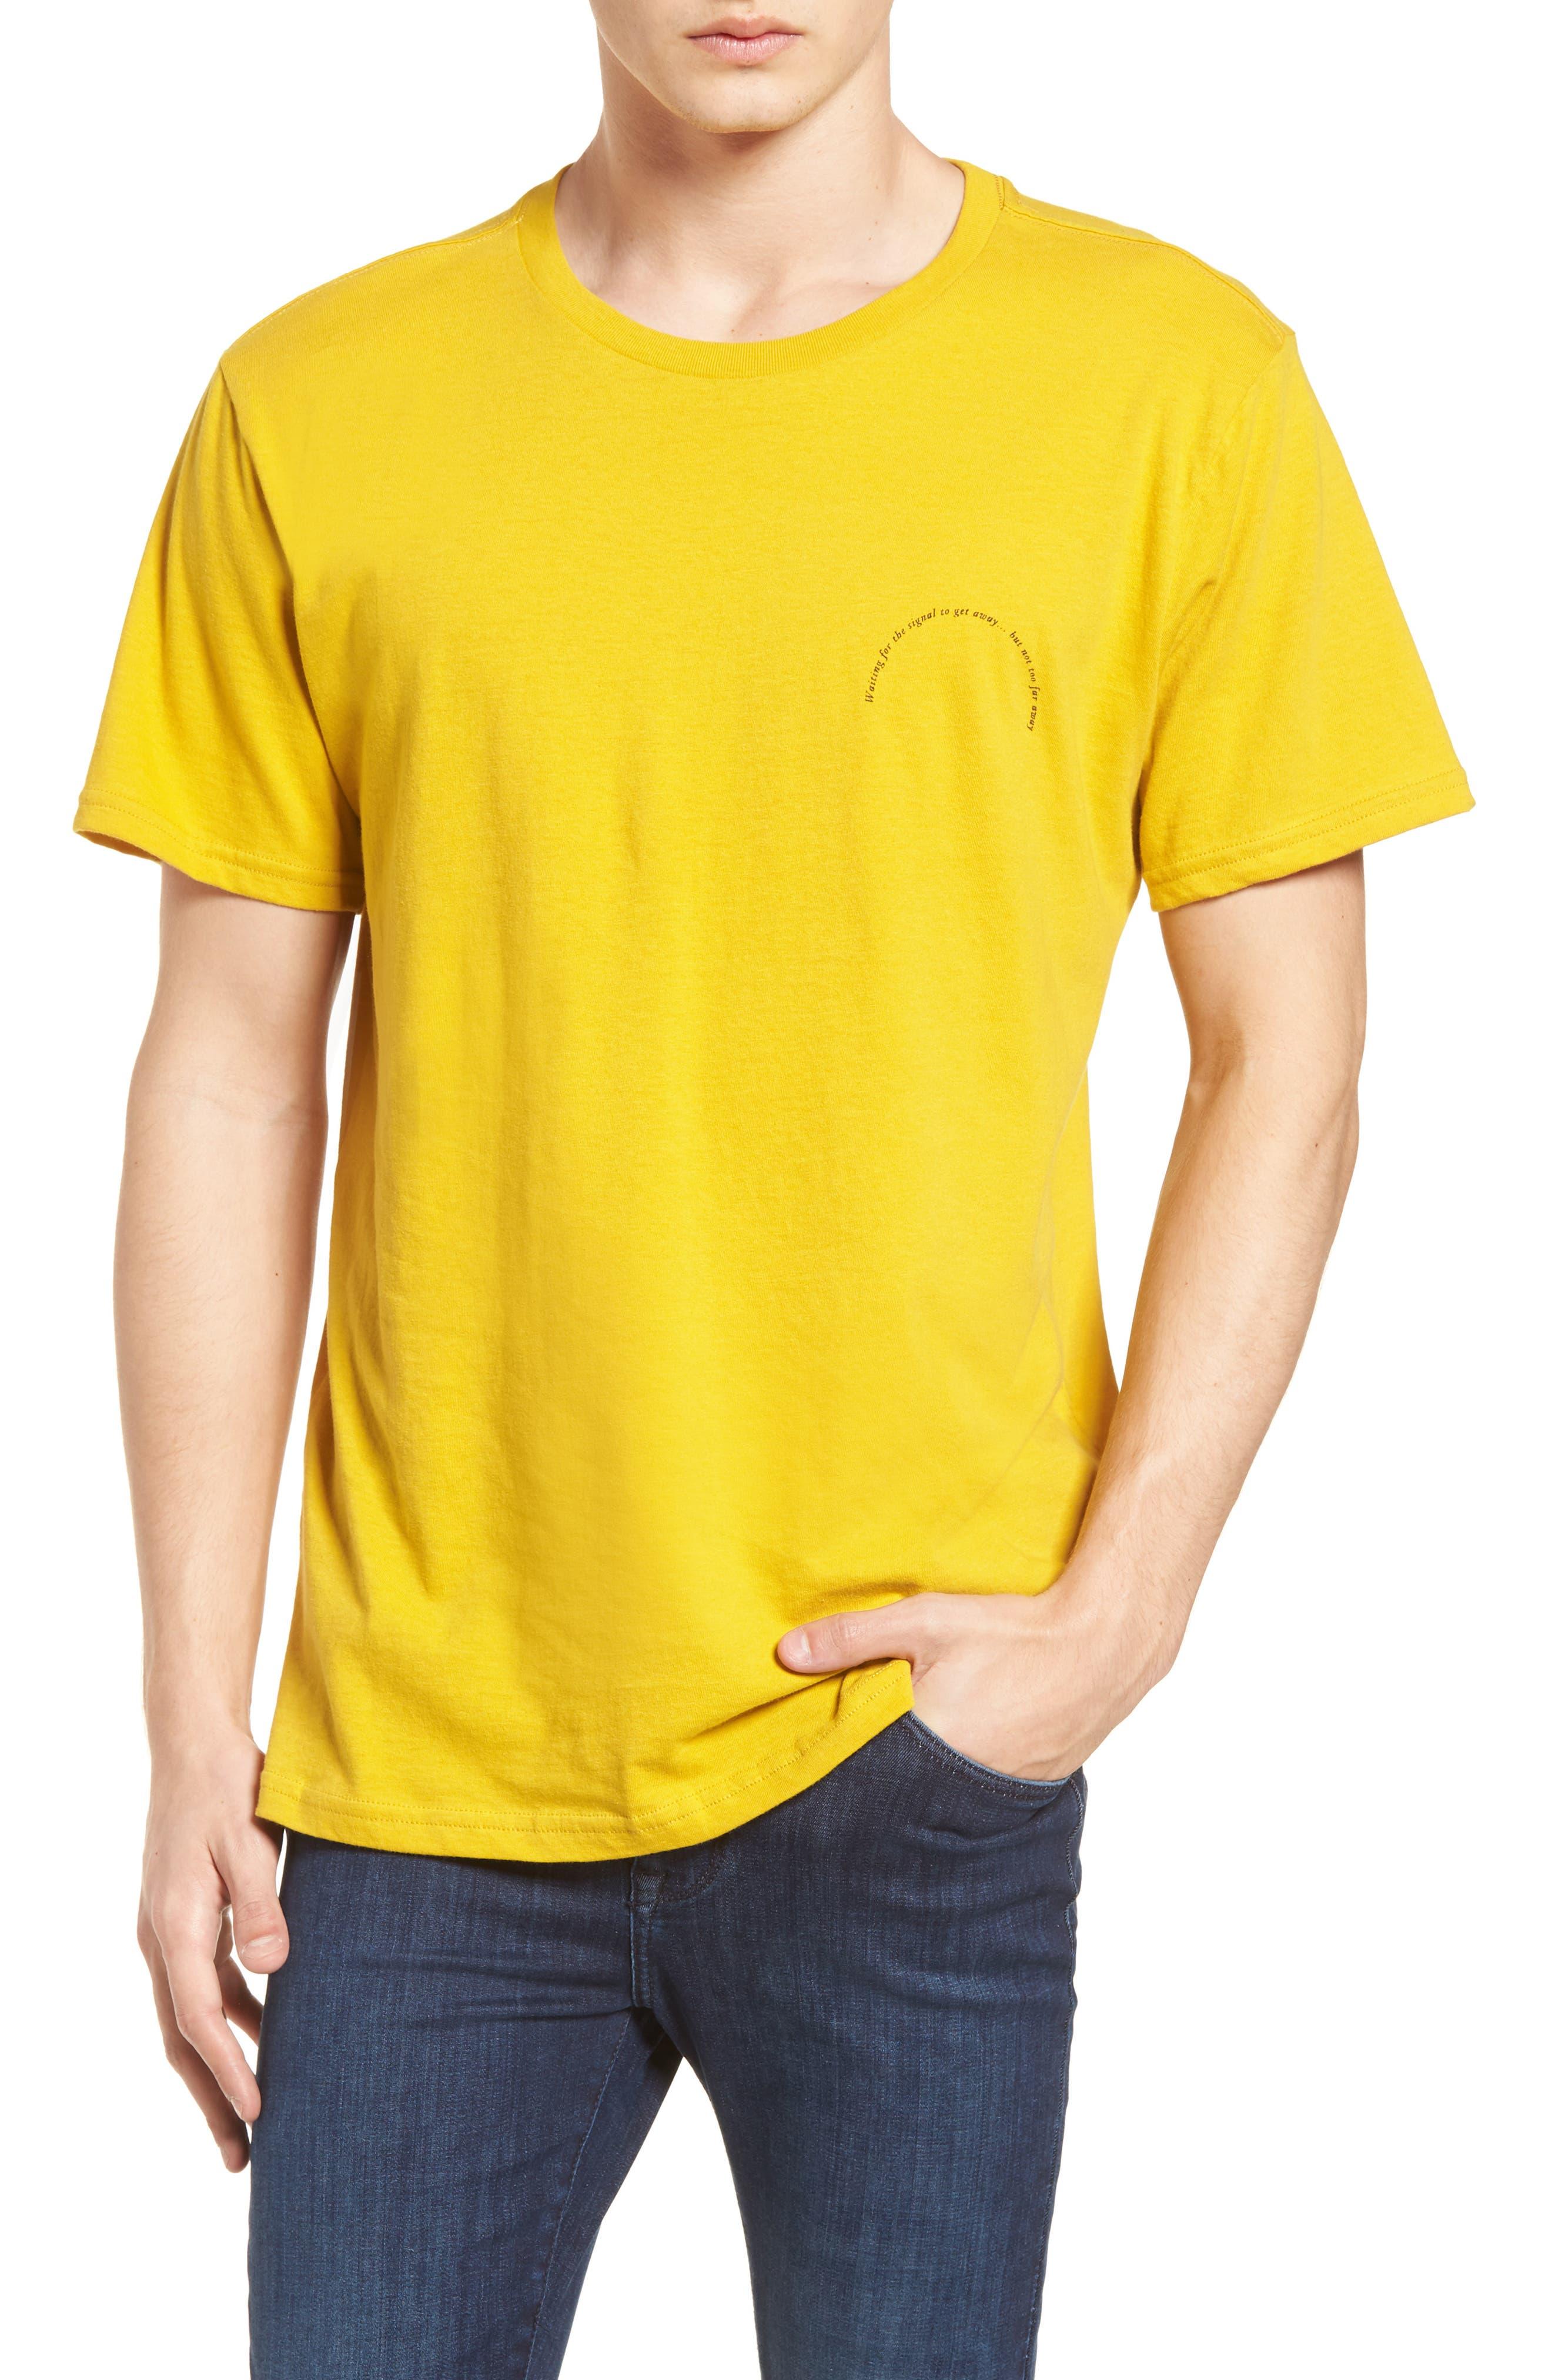 Twin Palms Graphic T-Shirt,                             Main thumbnail 1, color,                             701